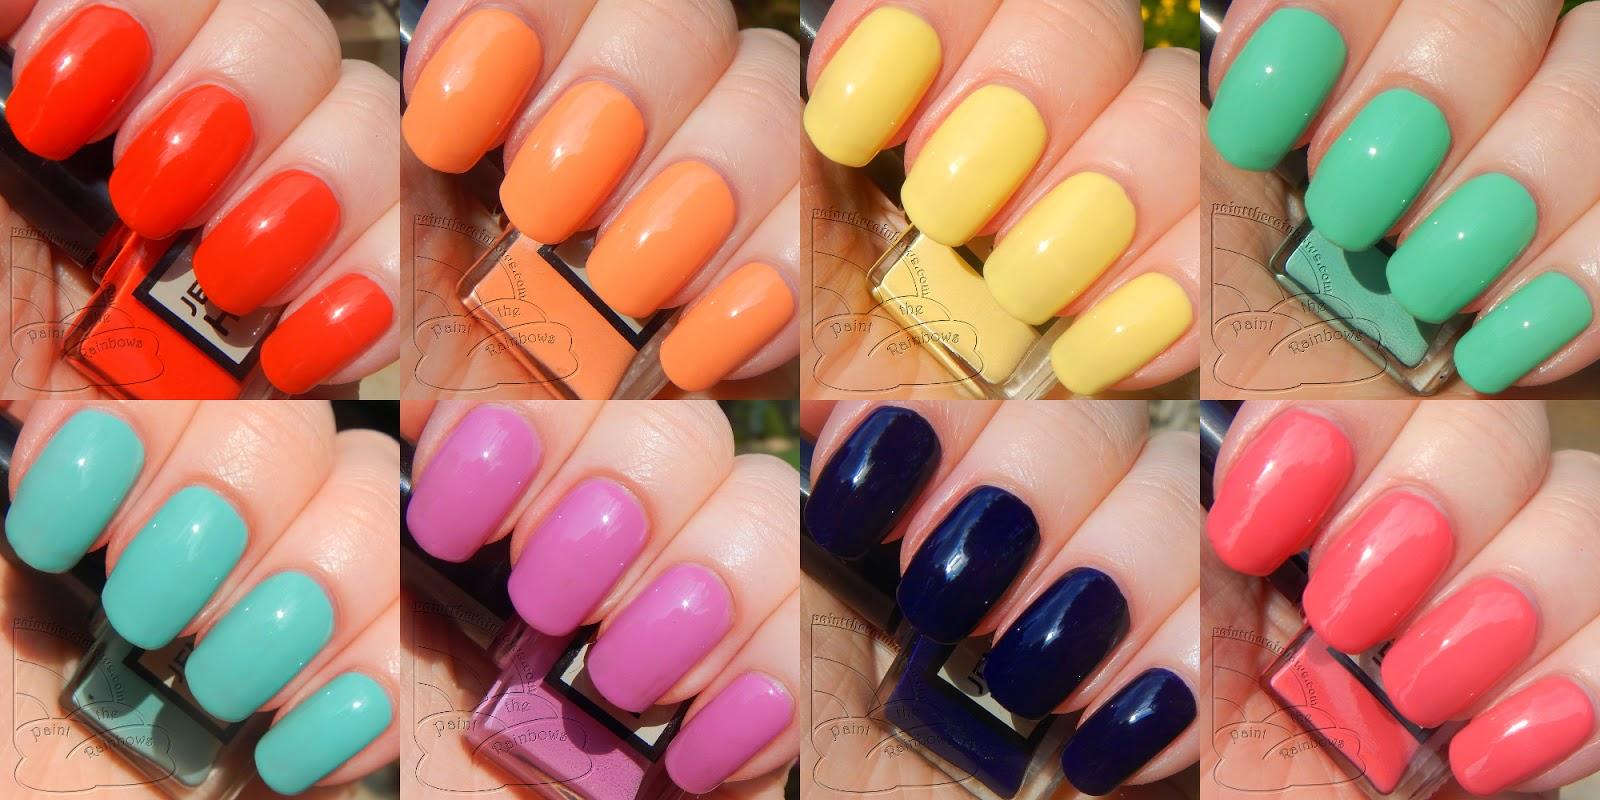 paint the rainbows ☆彡: Jenna Hipp for Costco: New Brights ...